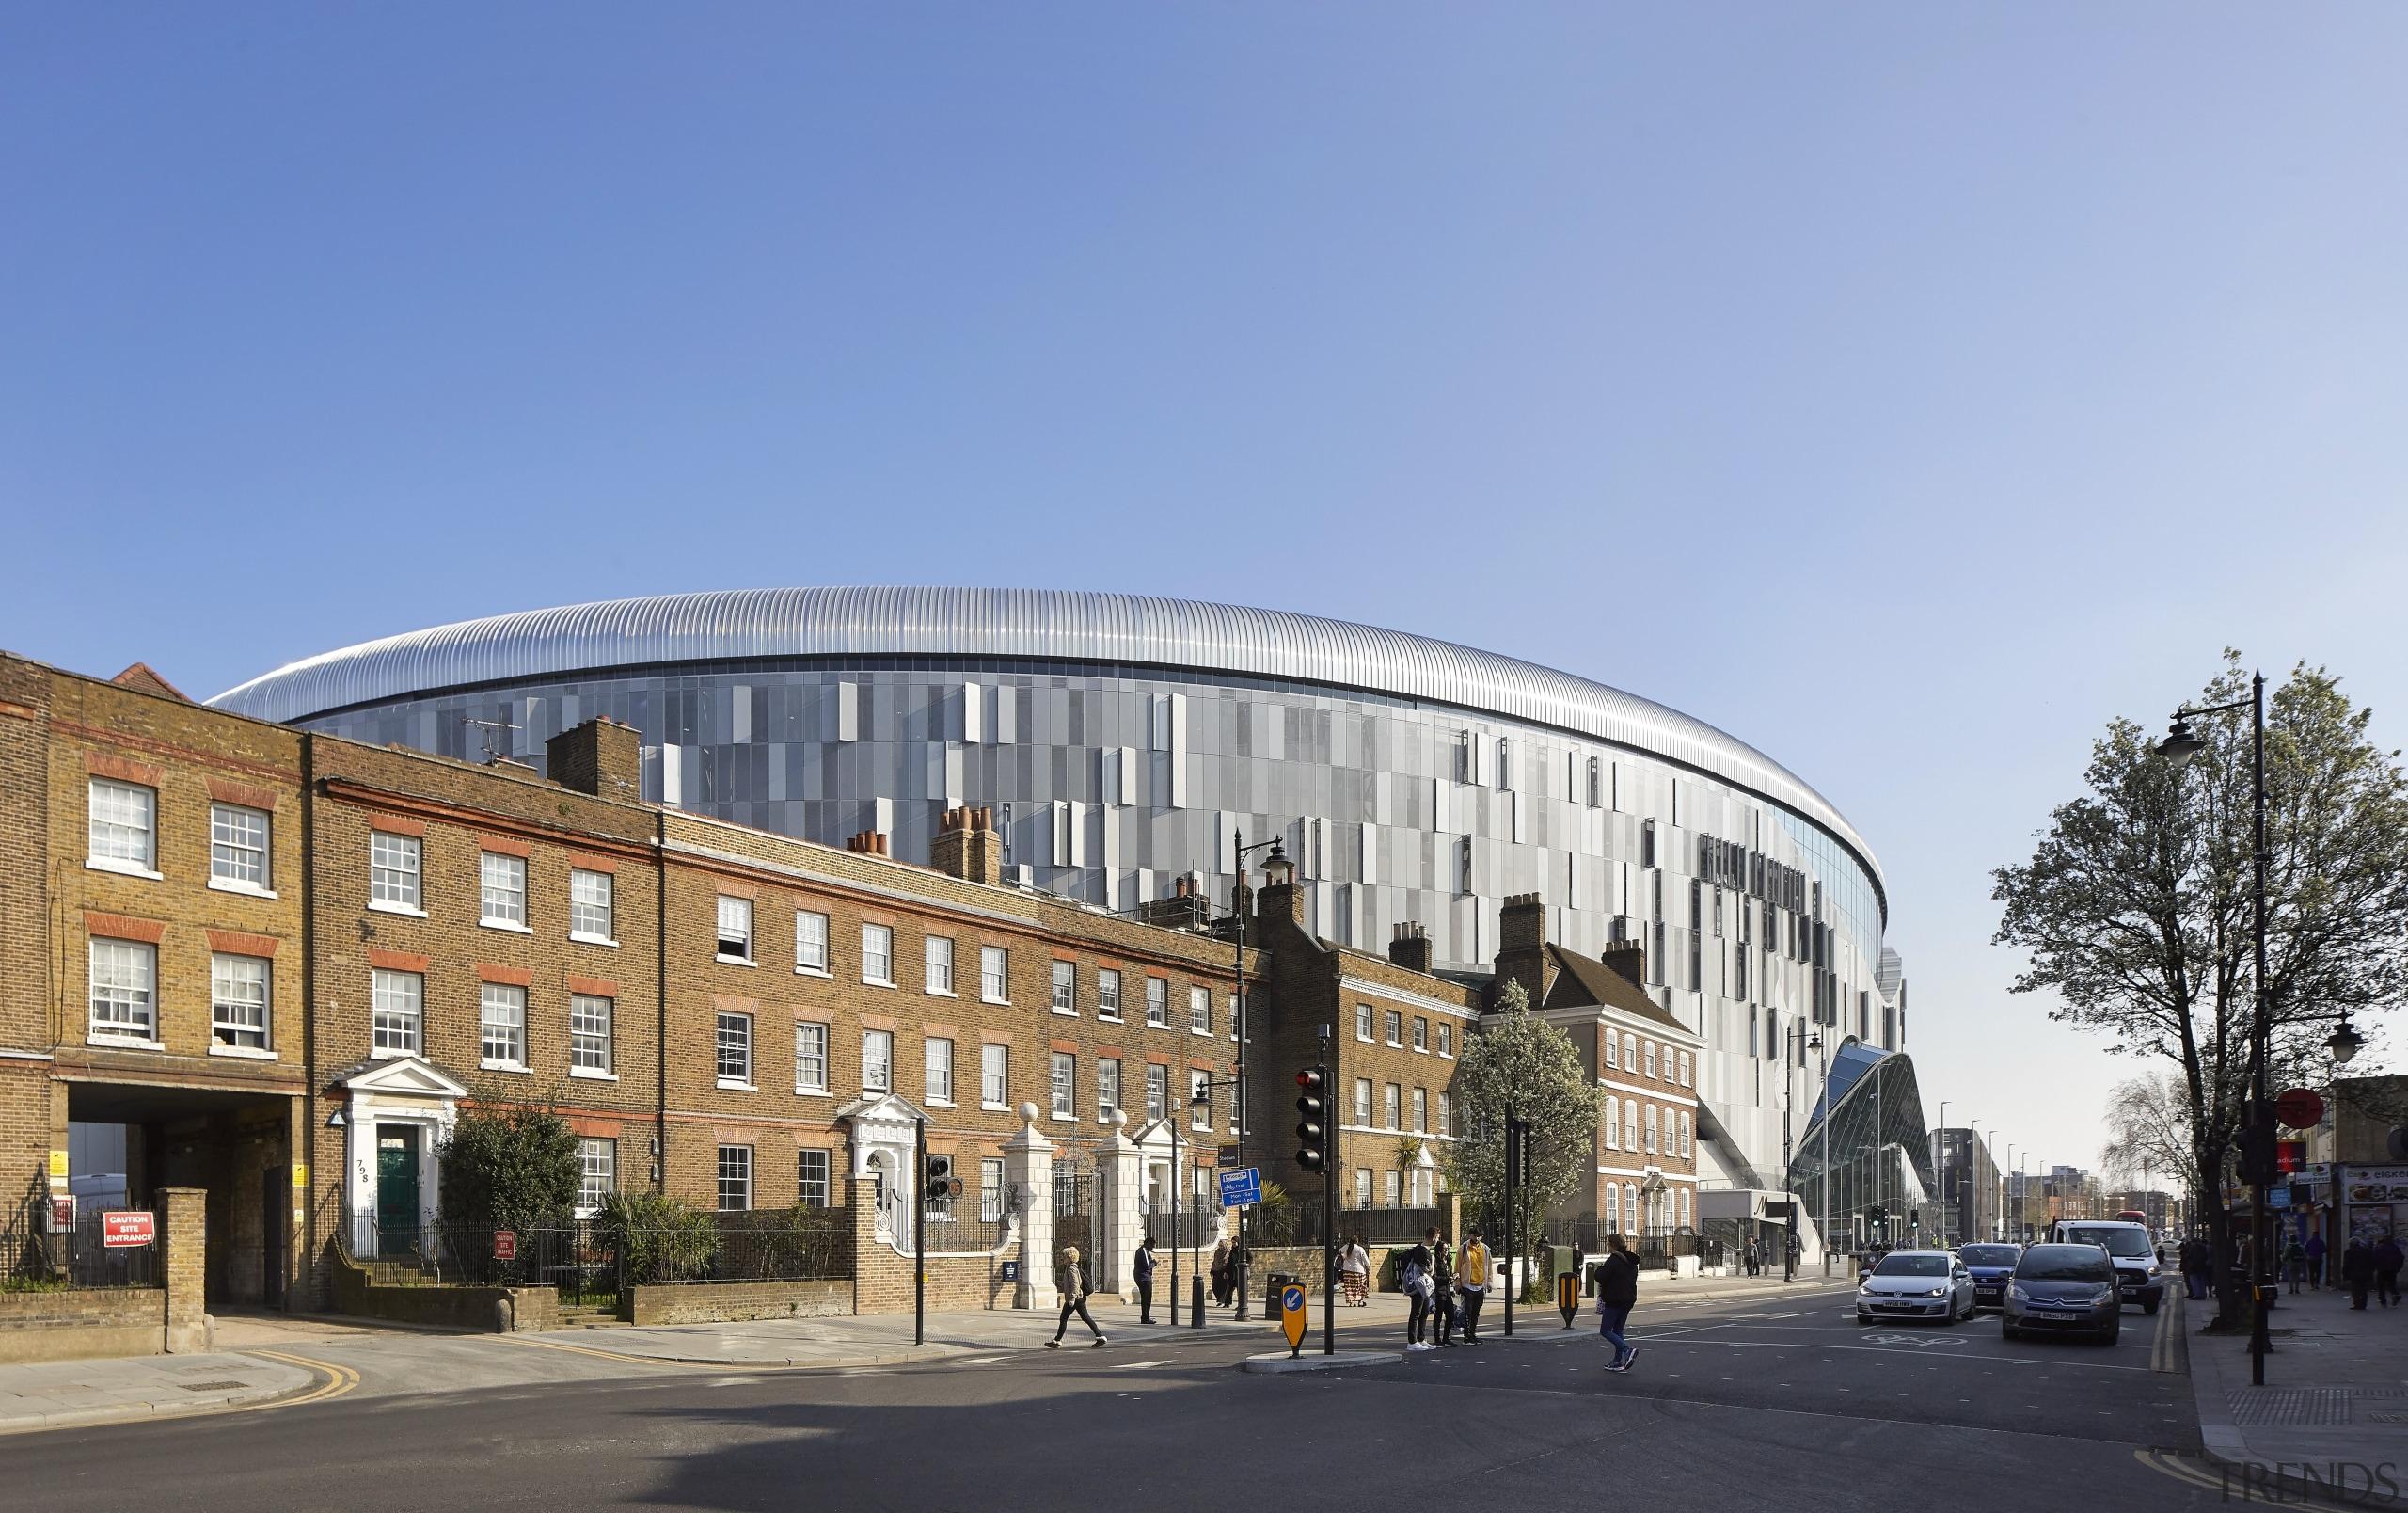 The new Tottenham Hotspur stadium transforms how stadia architecture, building, city, commercial building, facade, landmark, metropolitan area, mixed-use, teal